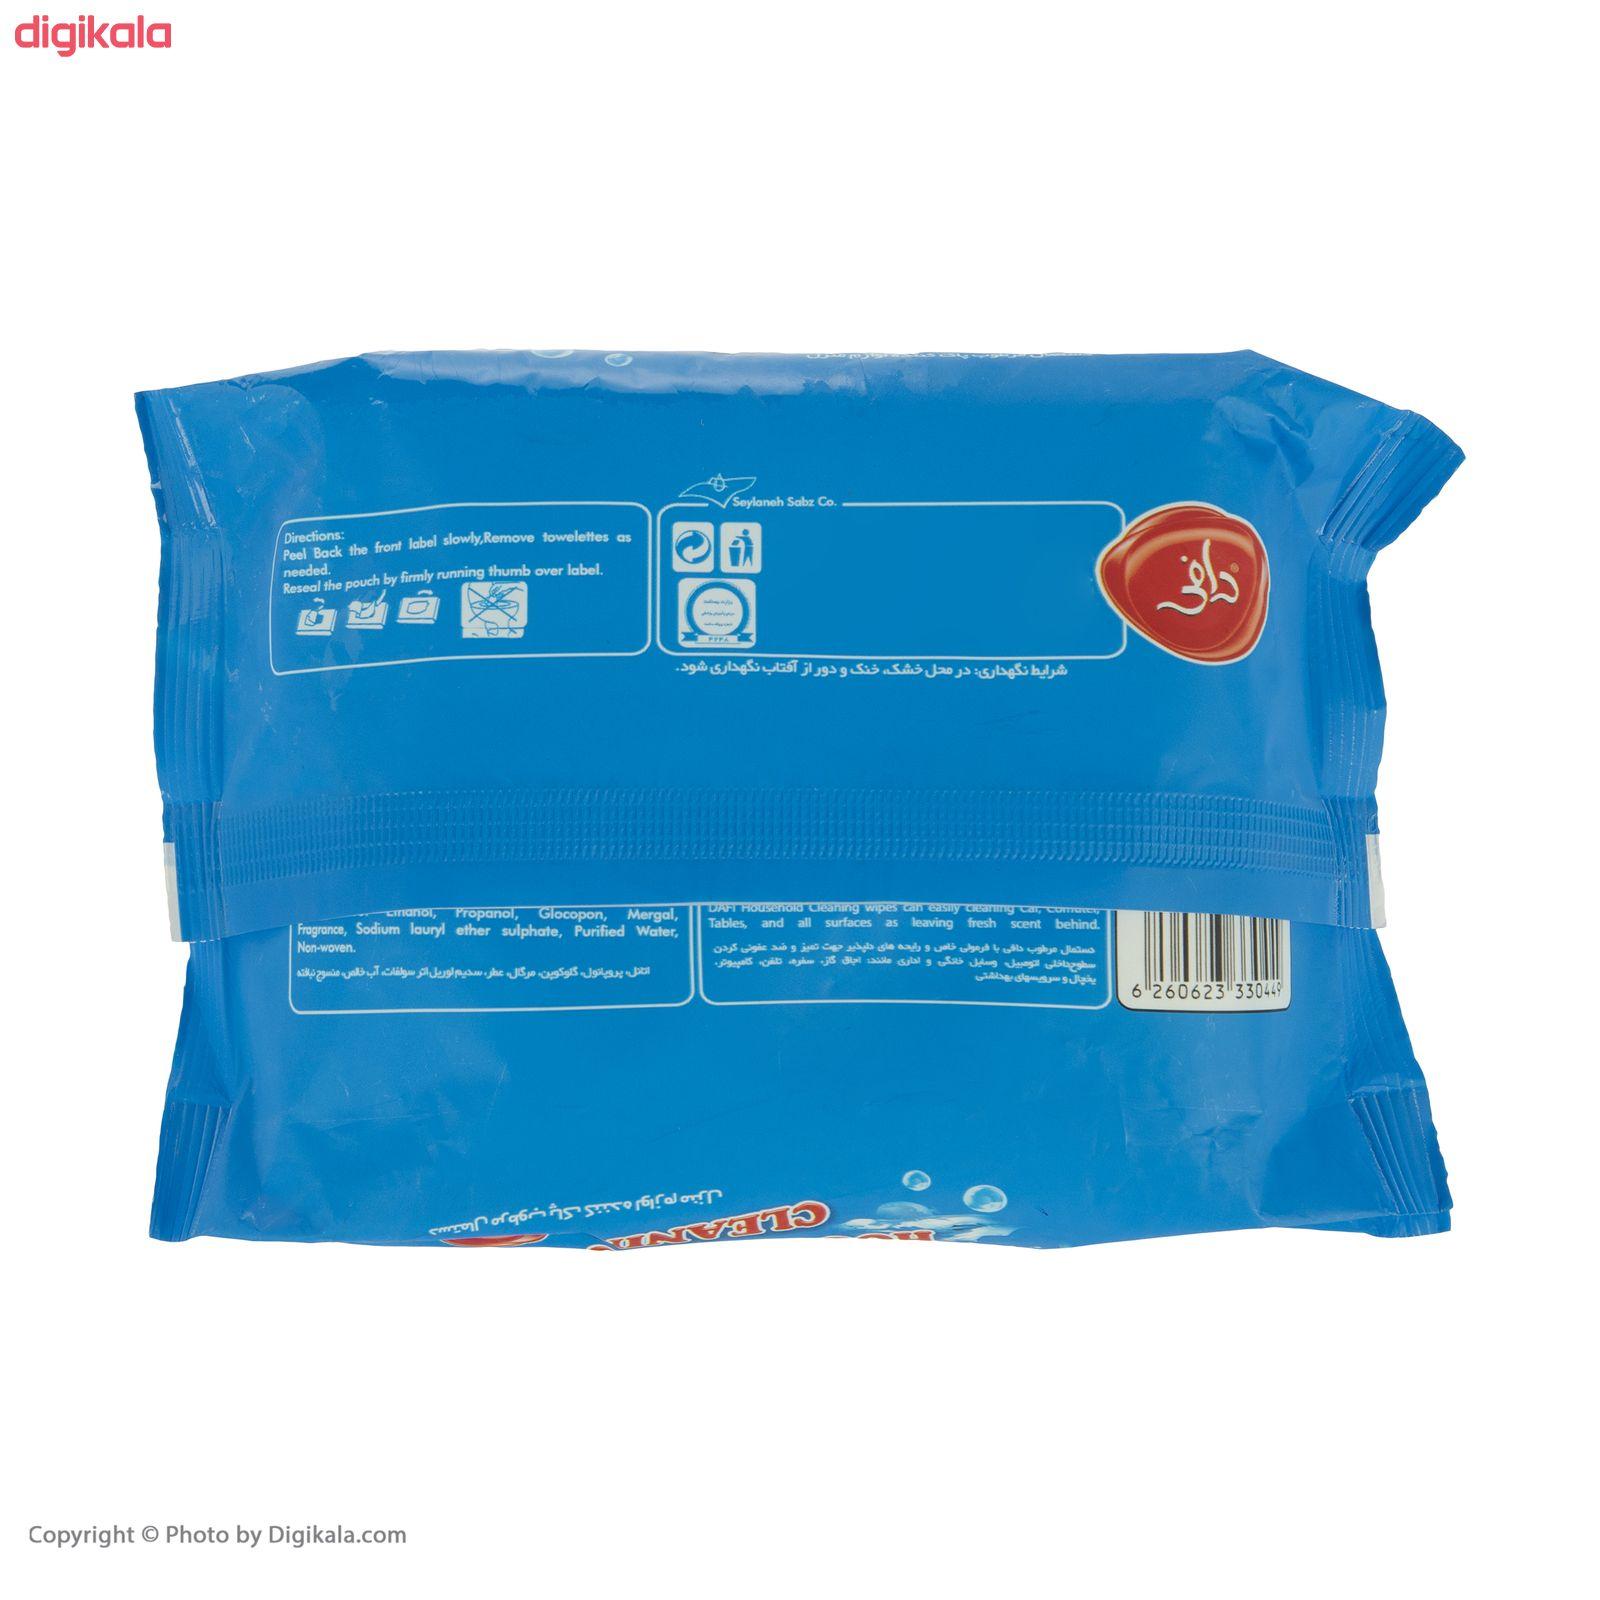 دستمال مرطوب دافی مدل Household Cleaning main 1 2